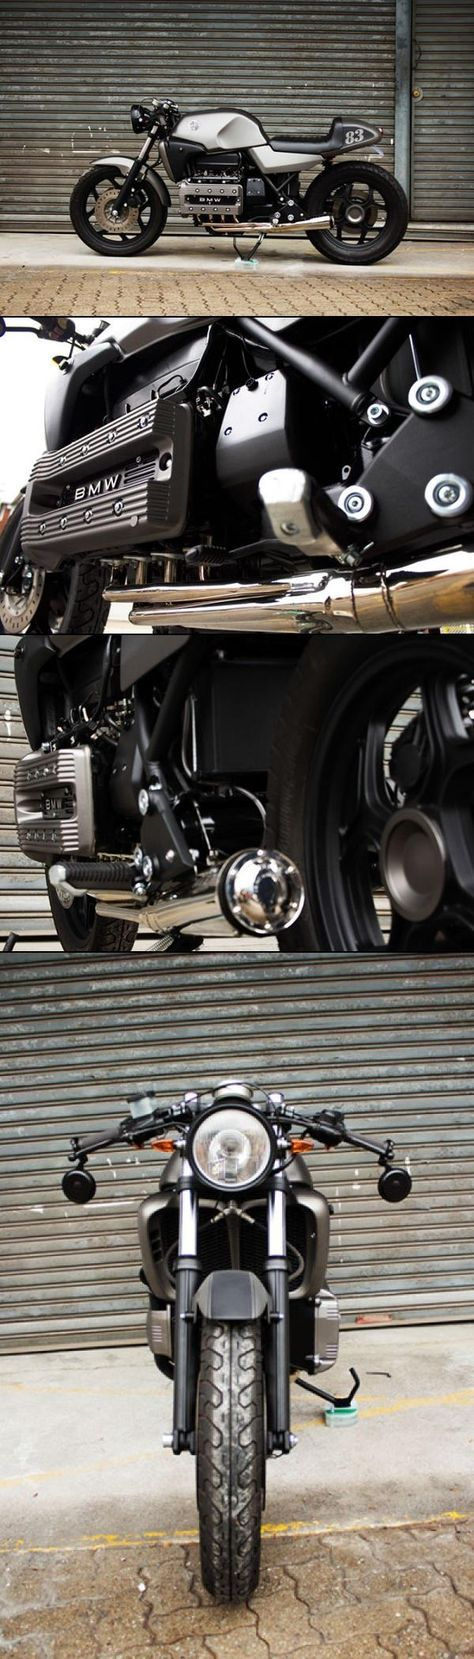 BMW K75 Custom Cafe Racer